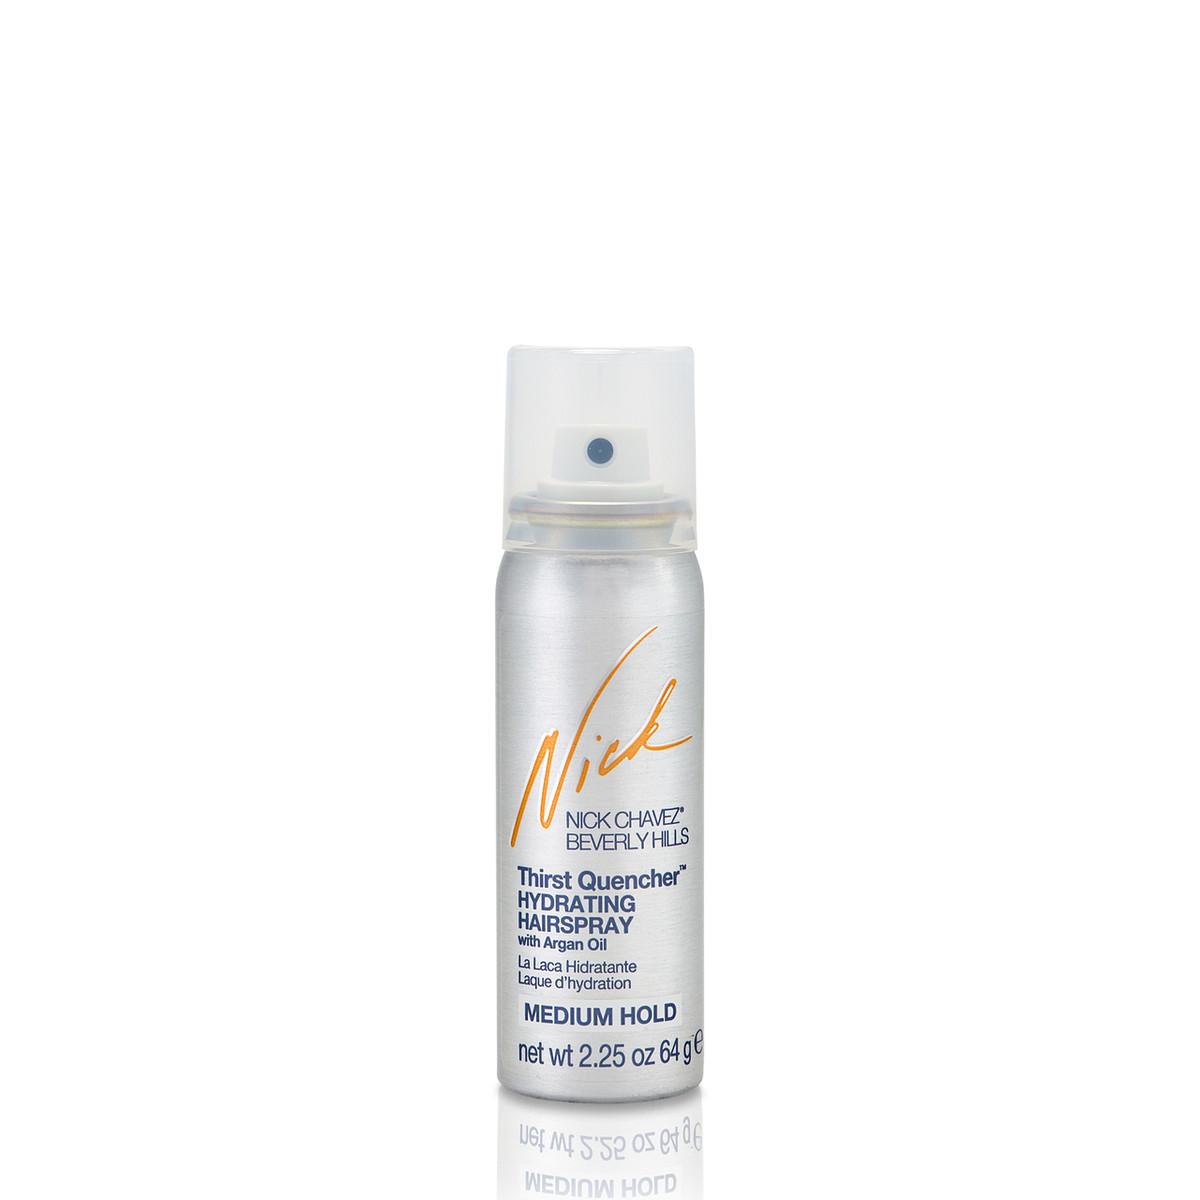 Thirst Quencher Travel Size Hairspray 2.25 oz